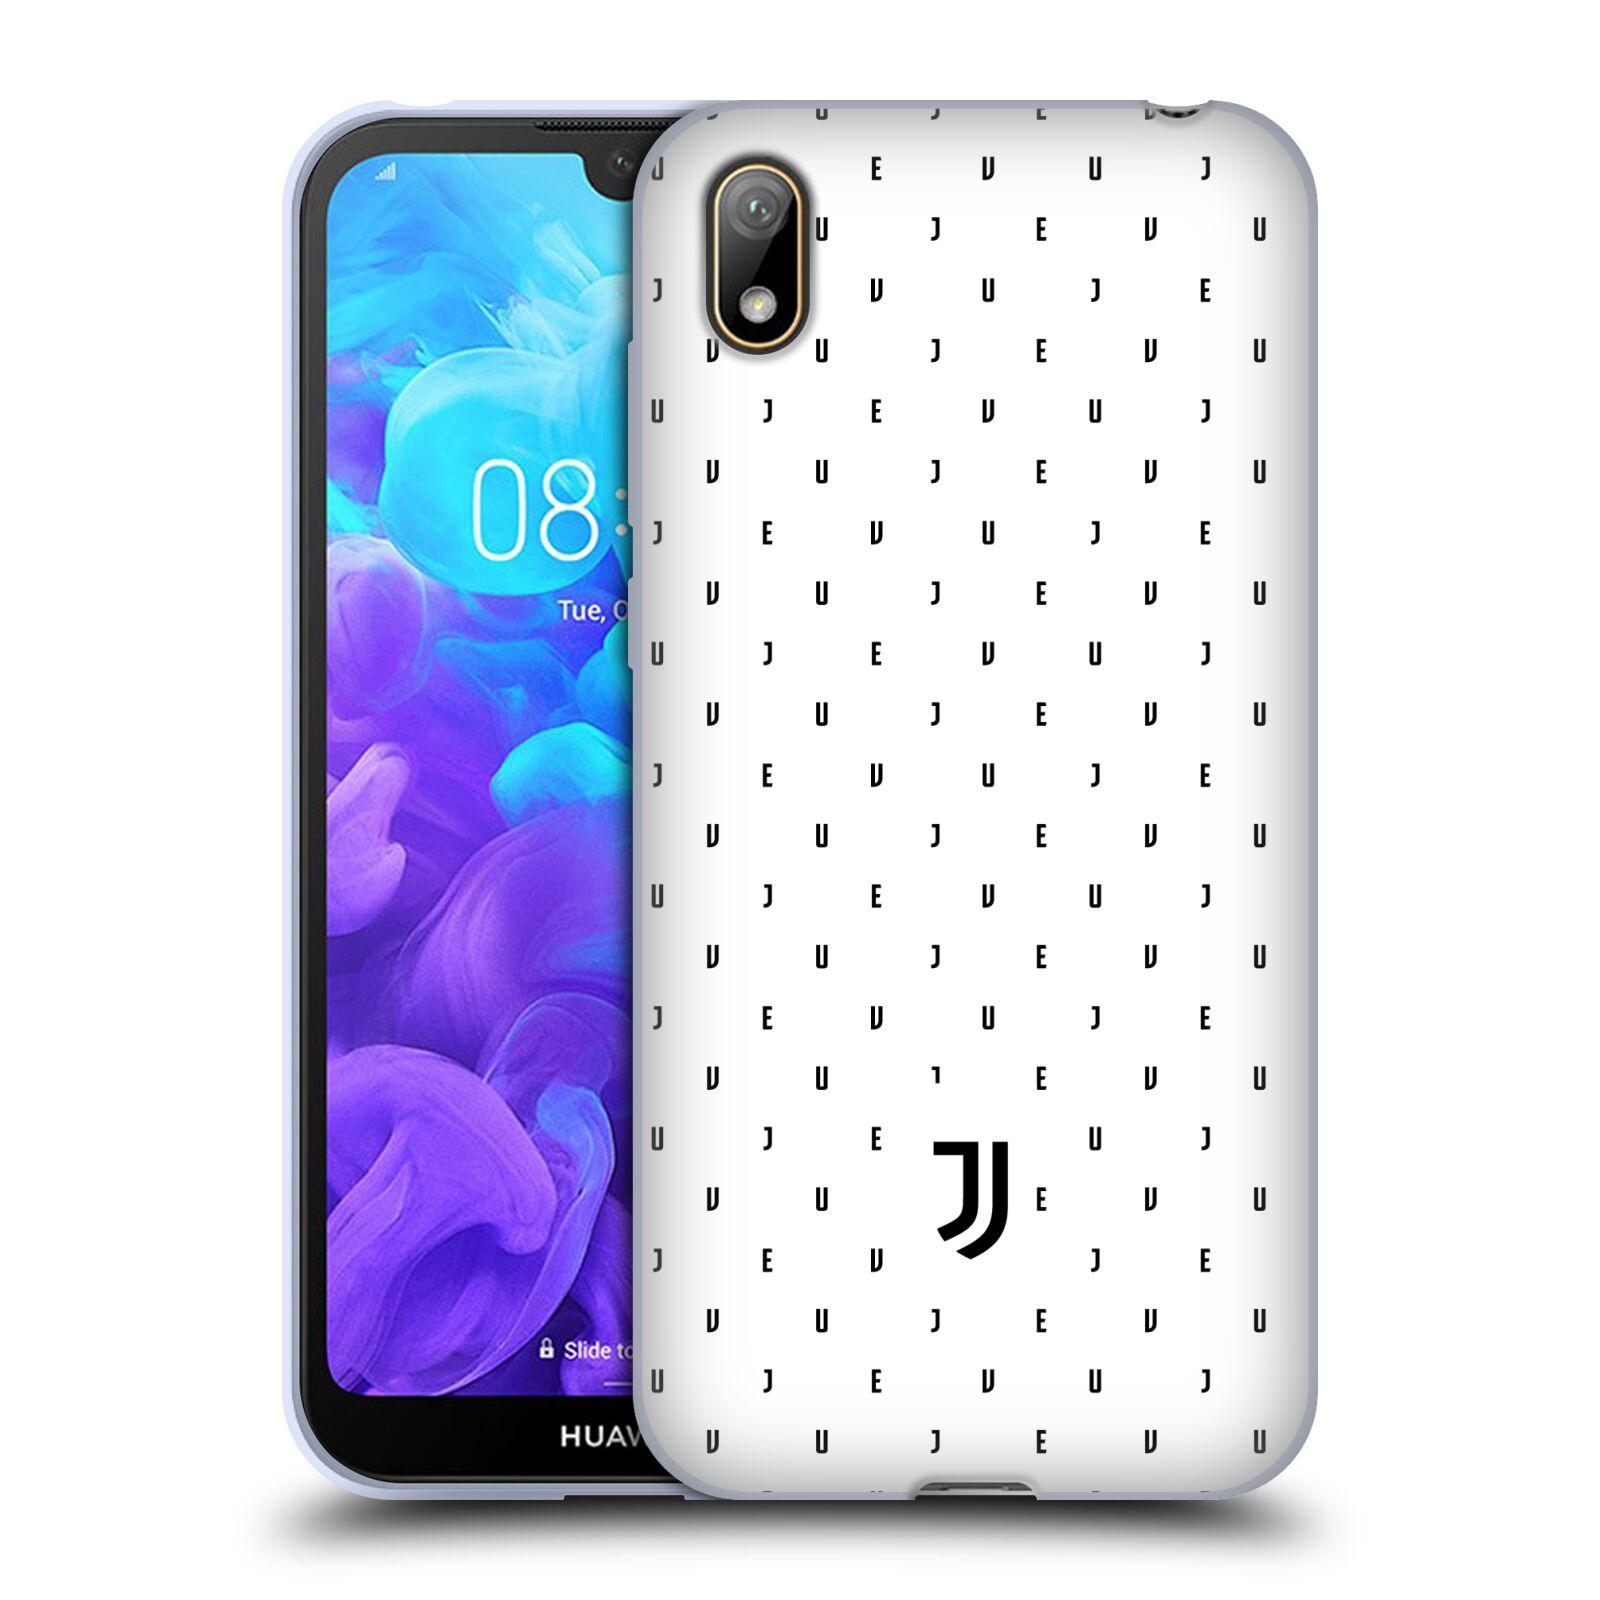 Silikonové pouzdro na mobil Huawei Y5 (2019) - Head Case - Juventus FC - Nové logo - Decentní